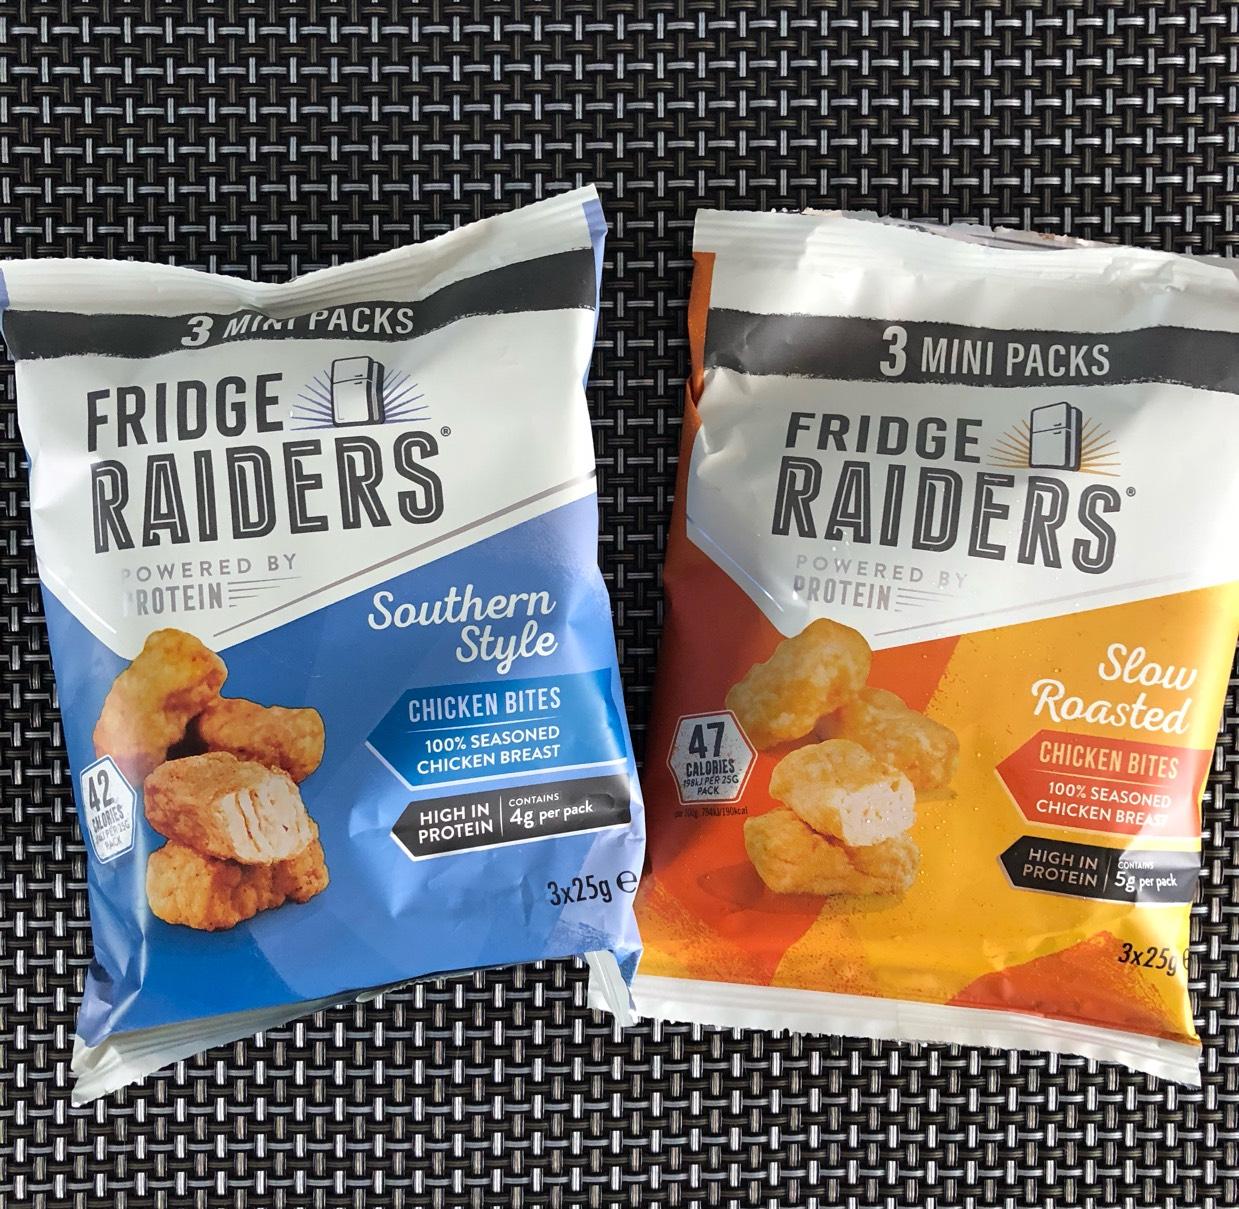 Fridge Raiders 3 x mini packs 50p in ASDA